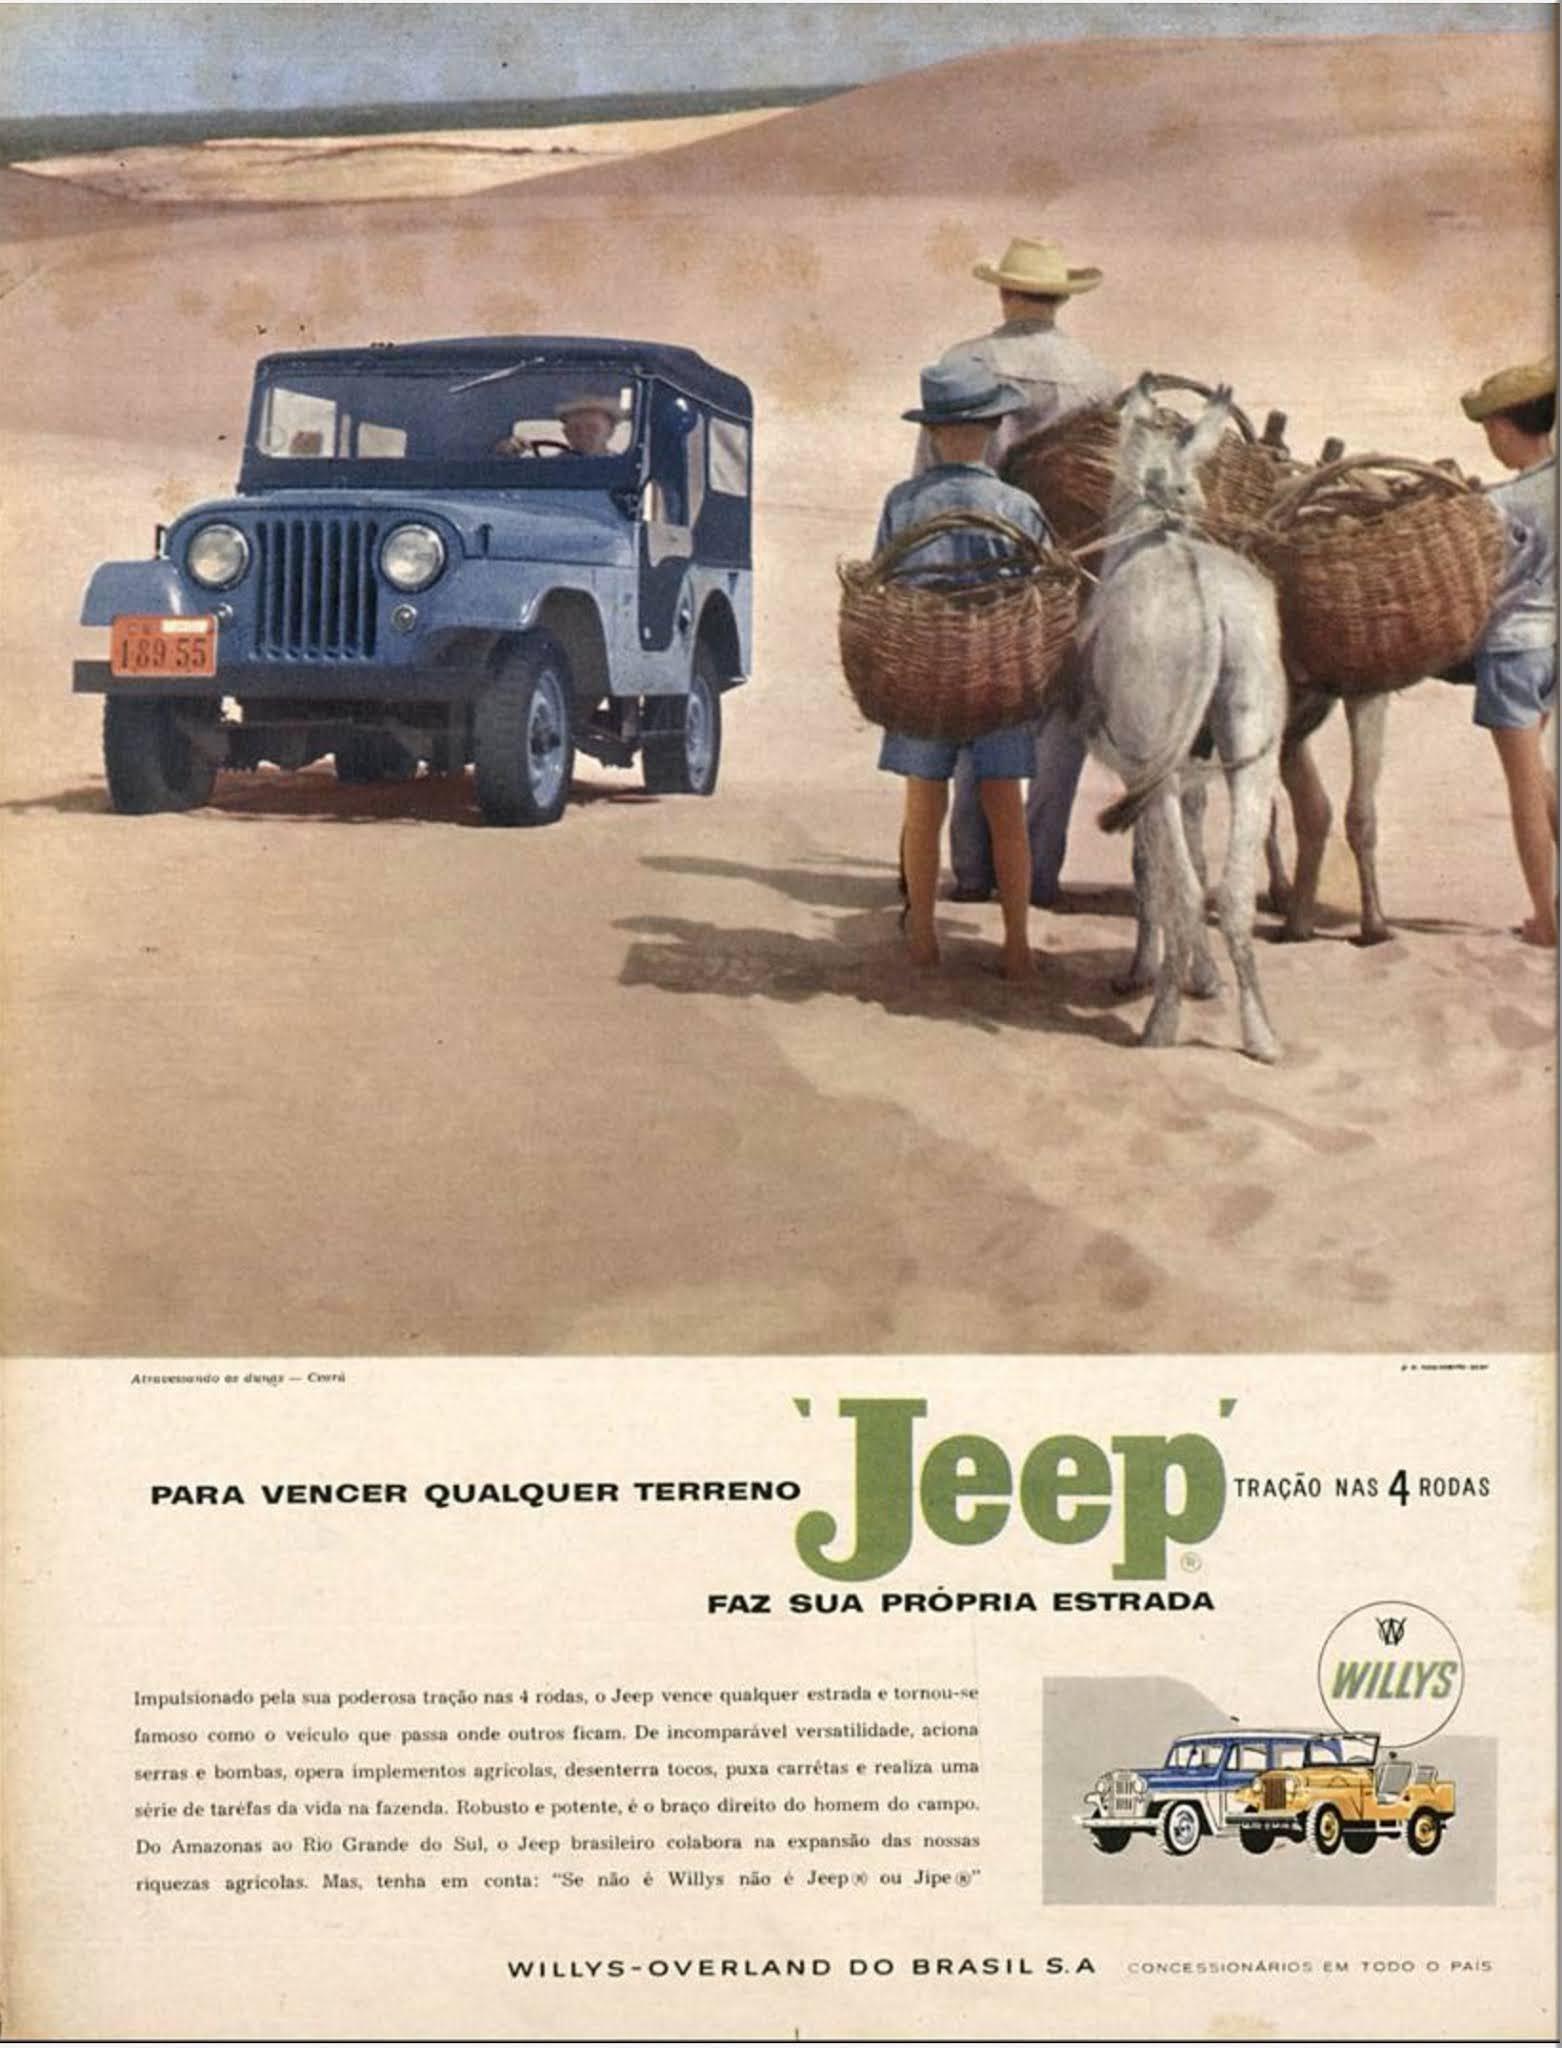 Propaganda da Willys promovendo o Jeep em 1959